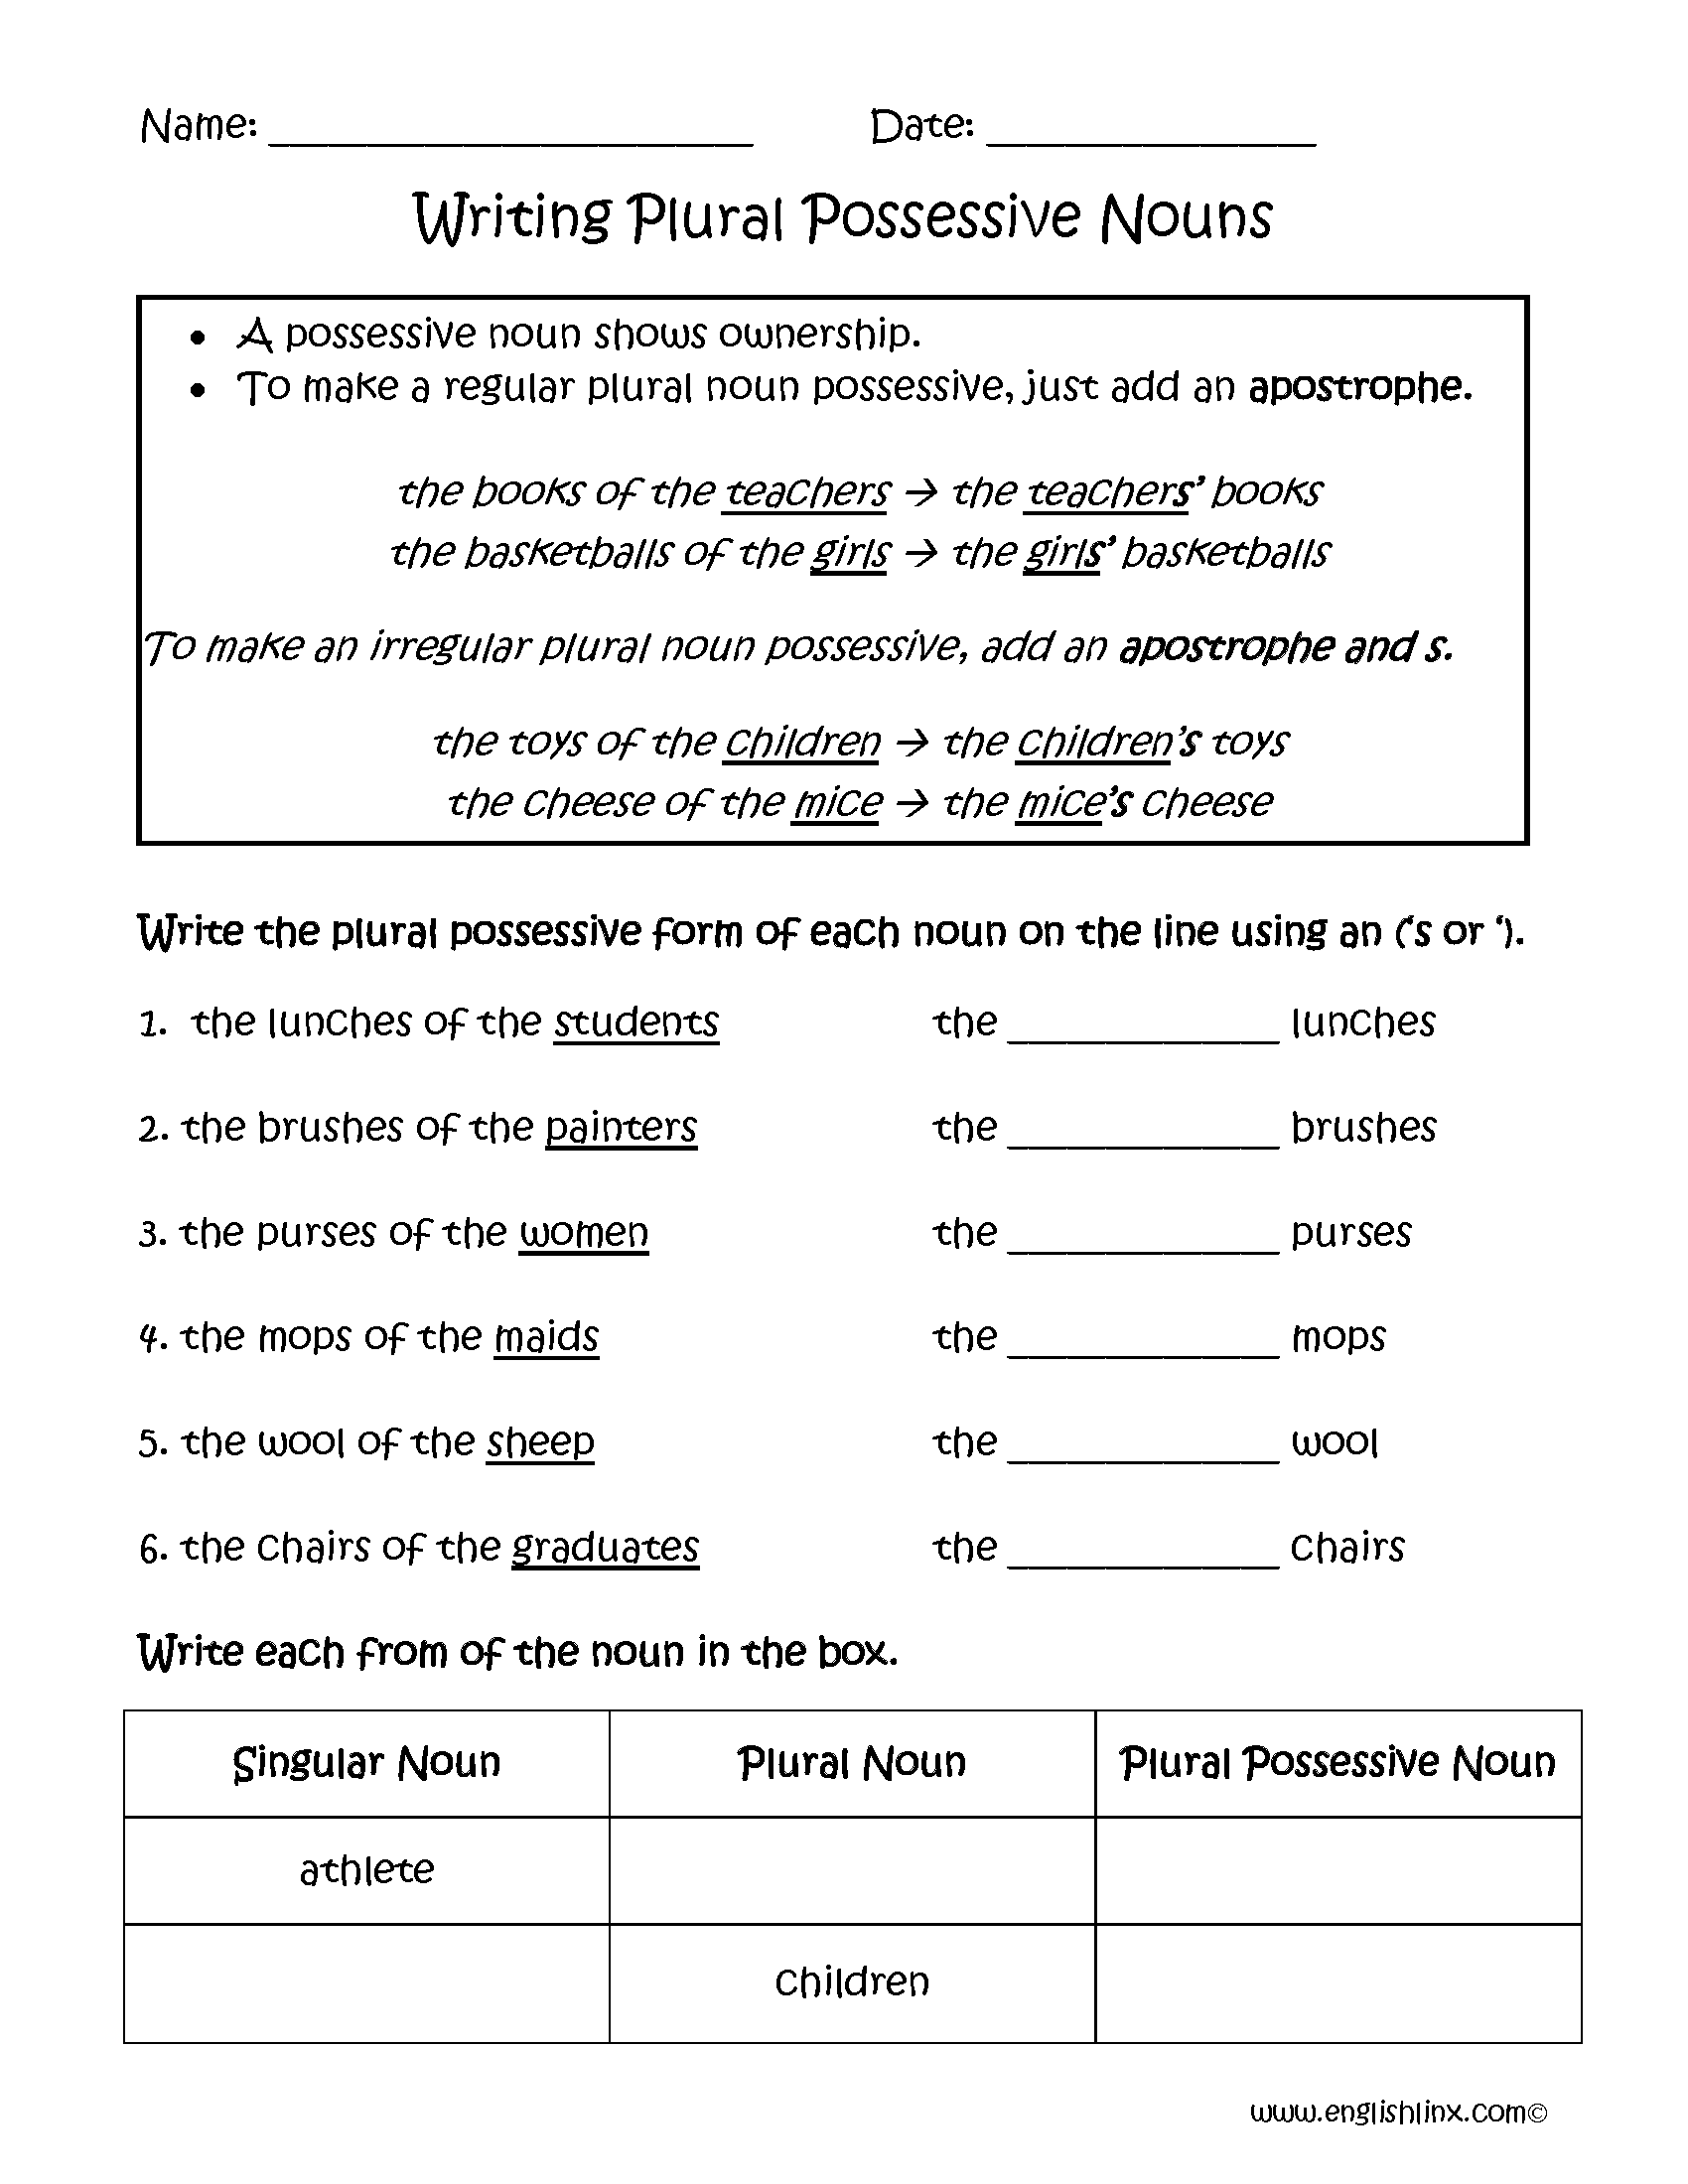 hight resolution of Possessive Nouns Worksheets   Writing Plural Possessive Nouns Worksheets